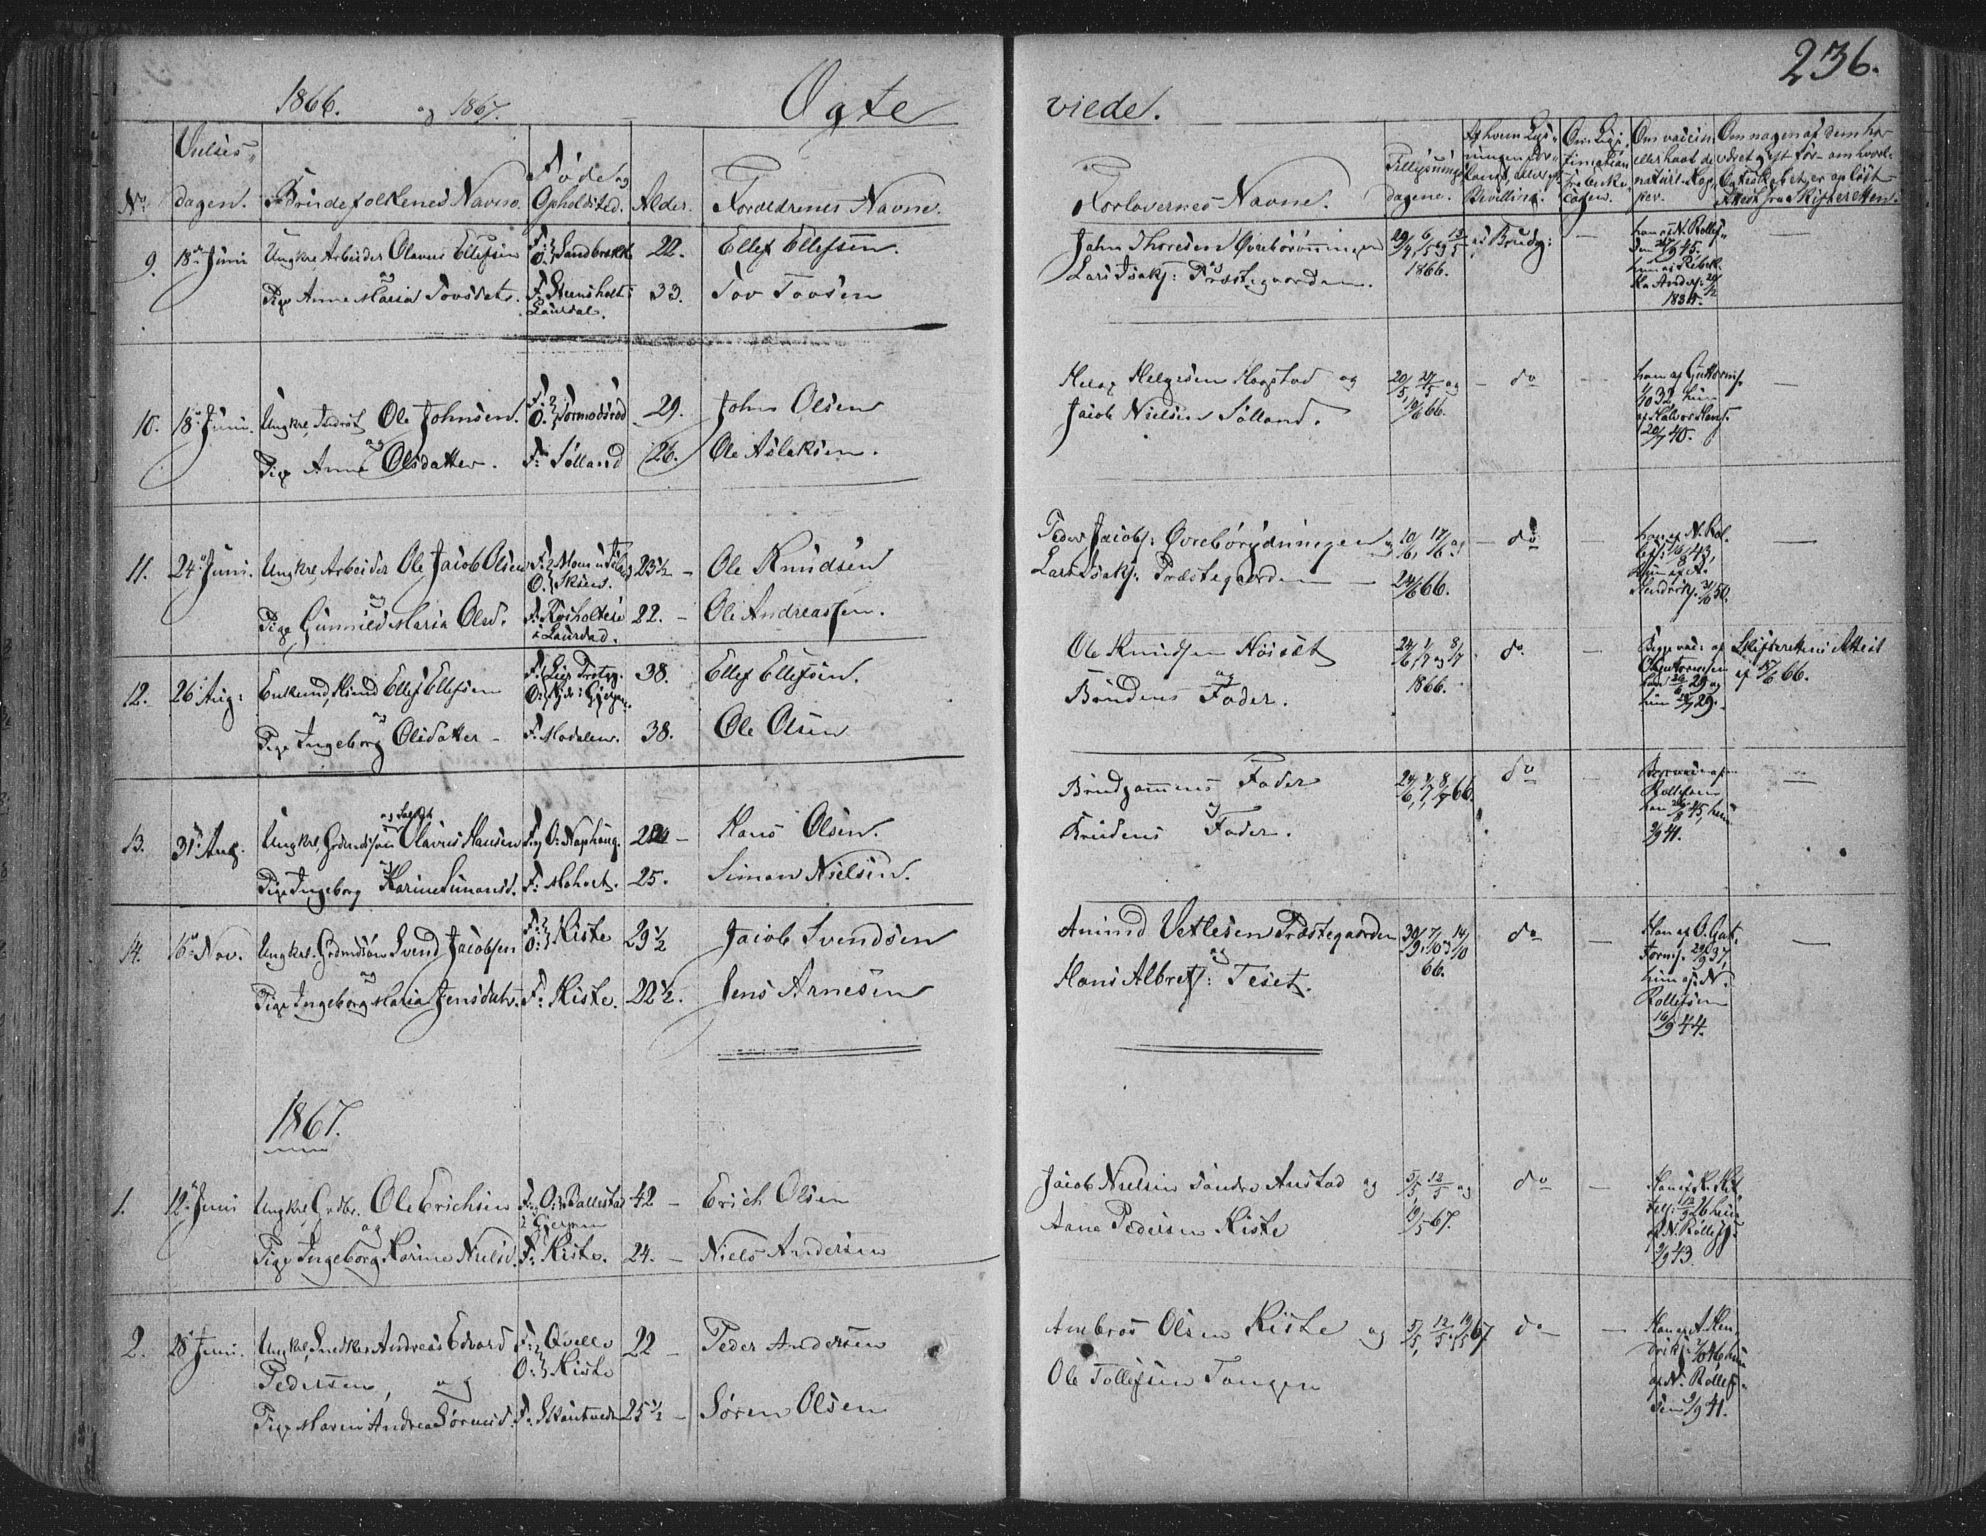 SAKO, Siljan kirkebøker, F/Fa/L0001: Parish register (official) no. 1, 1831-1870, p. 236